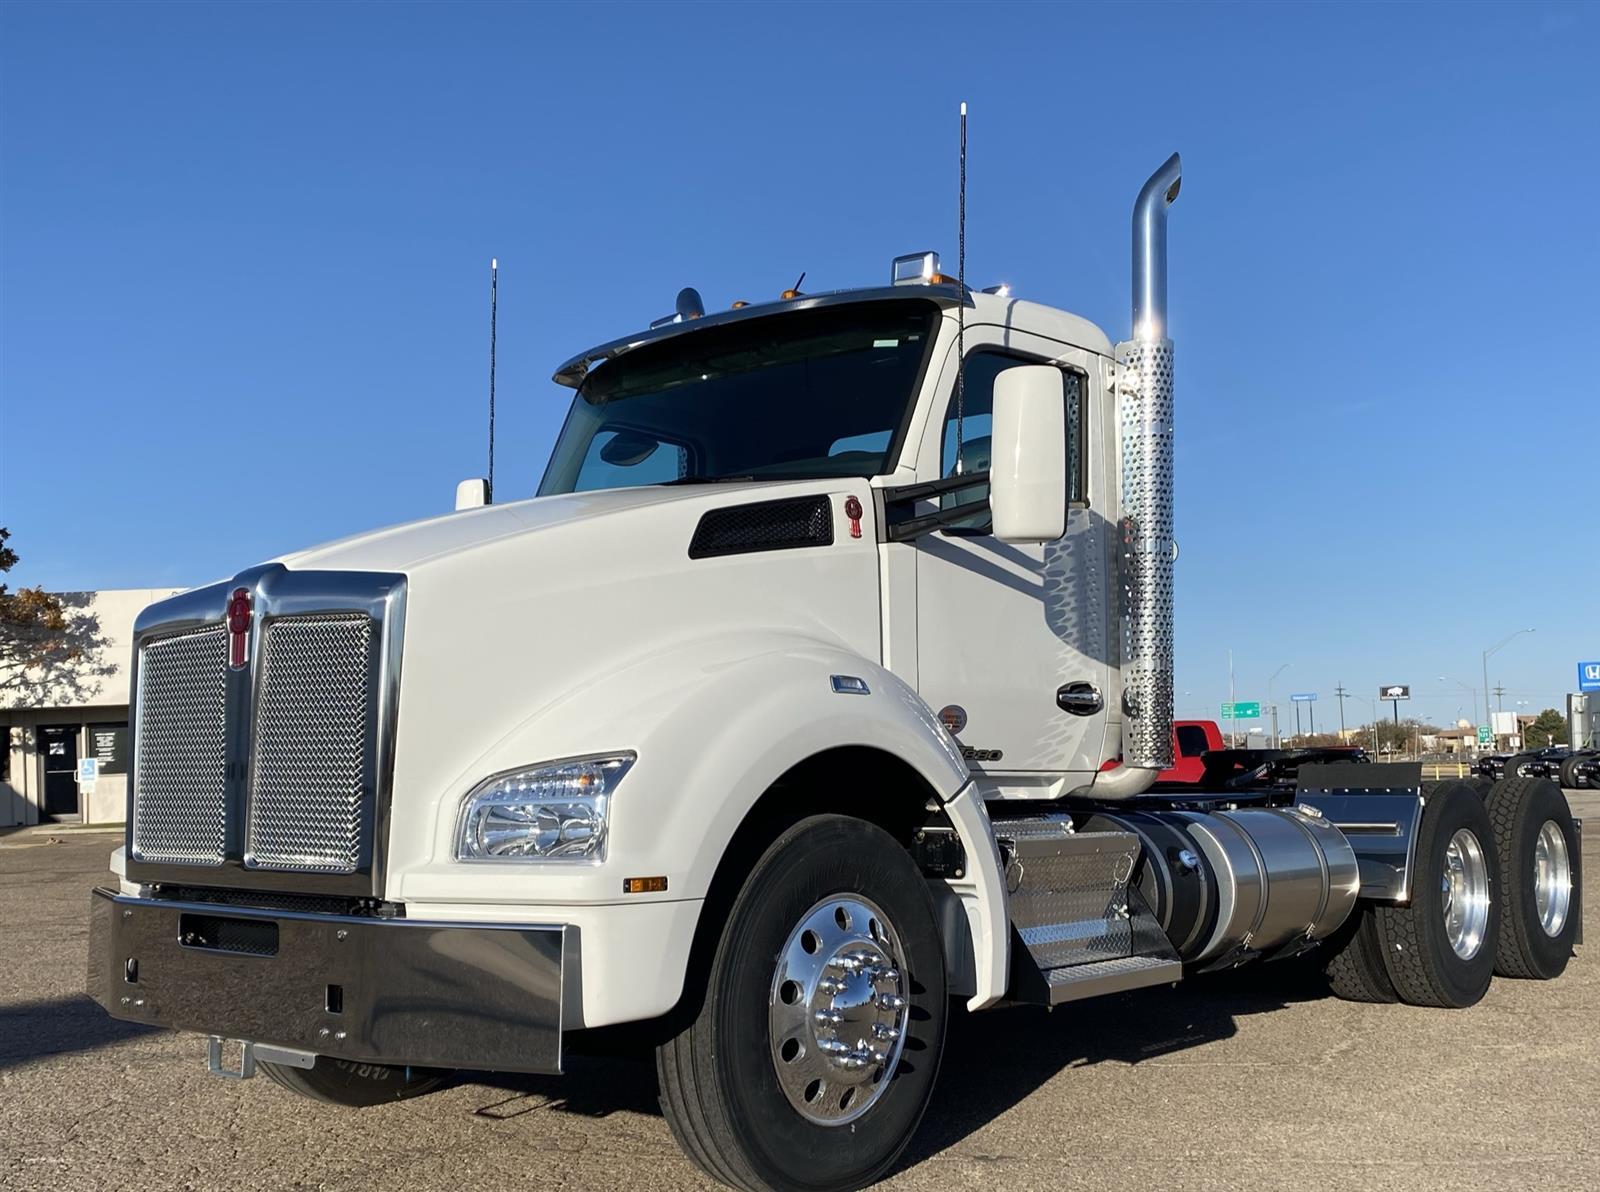 2020 Kenworth T880 6x4, Tractor #LJ374096 - photo 1